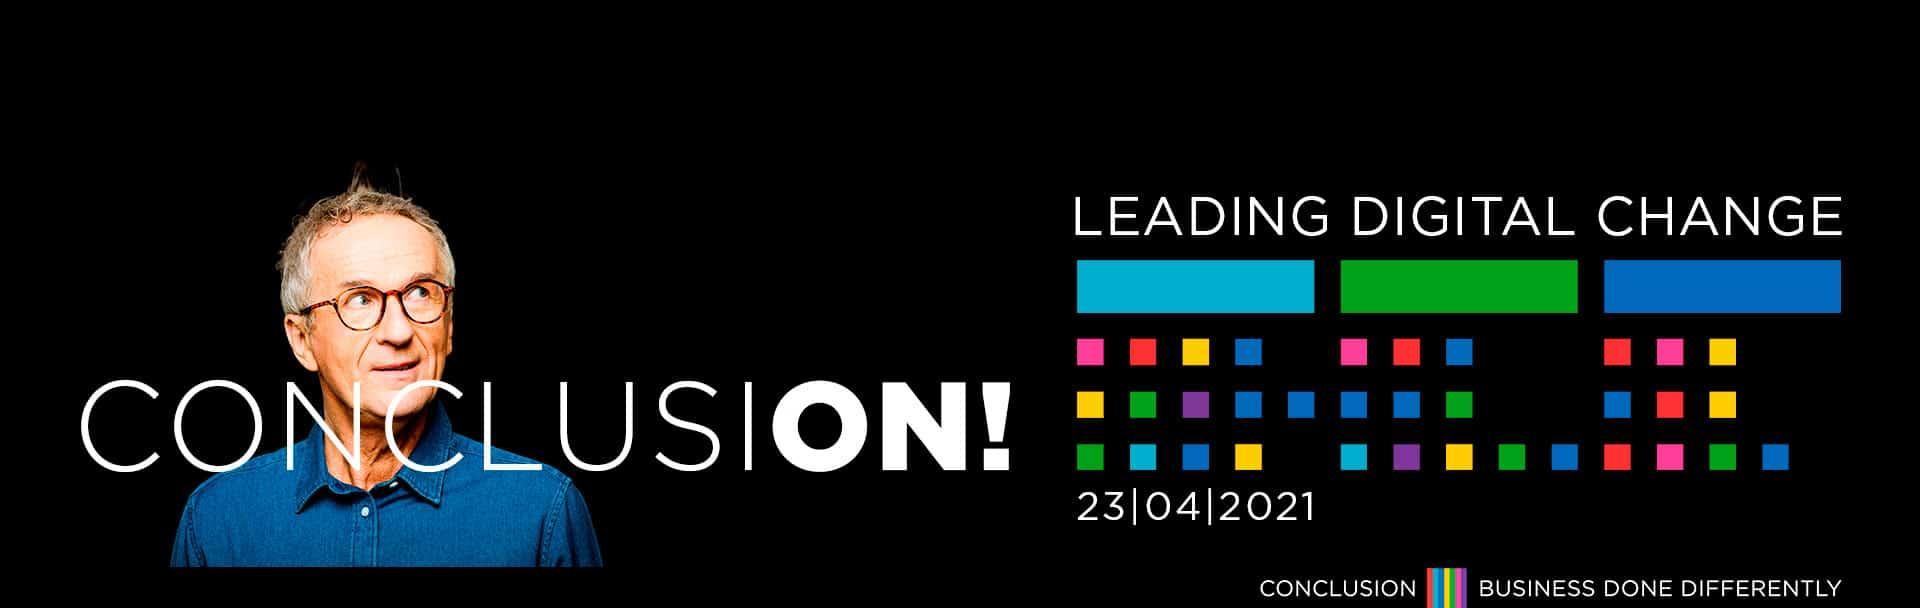 ConclusiON - Leading Digital Change